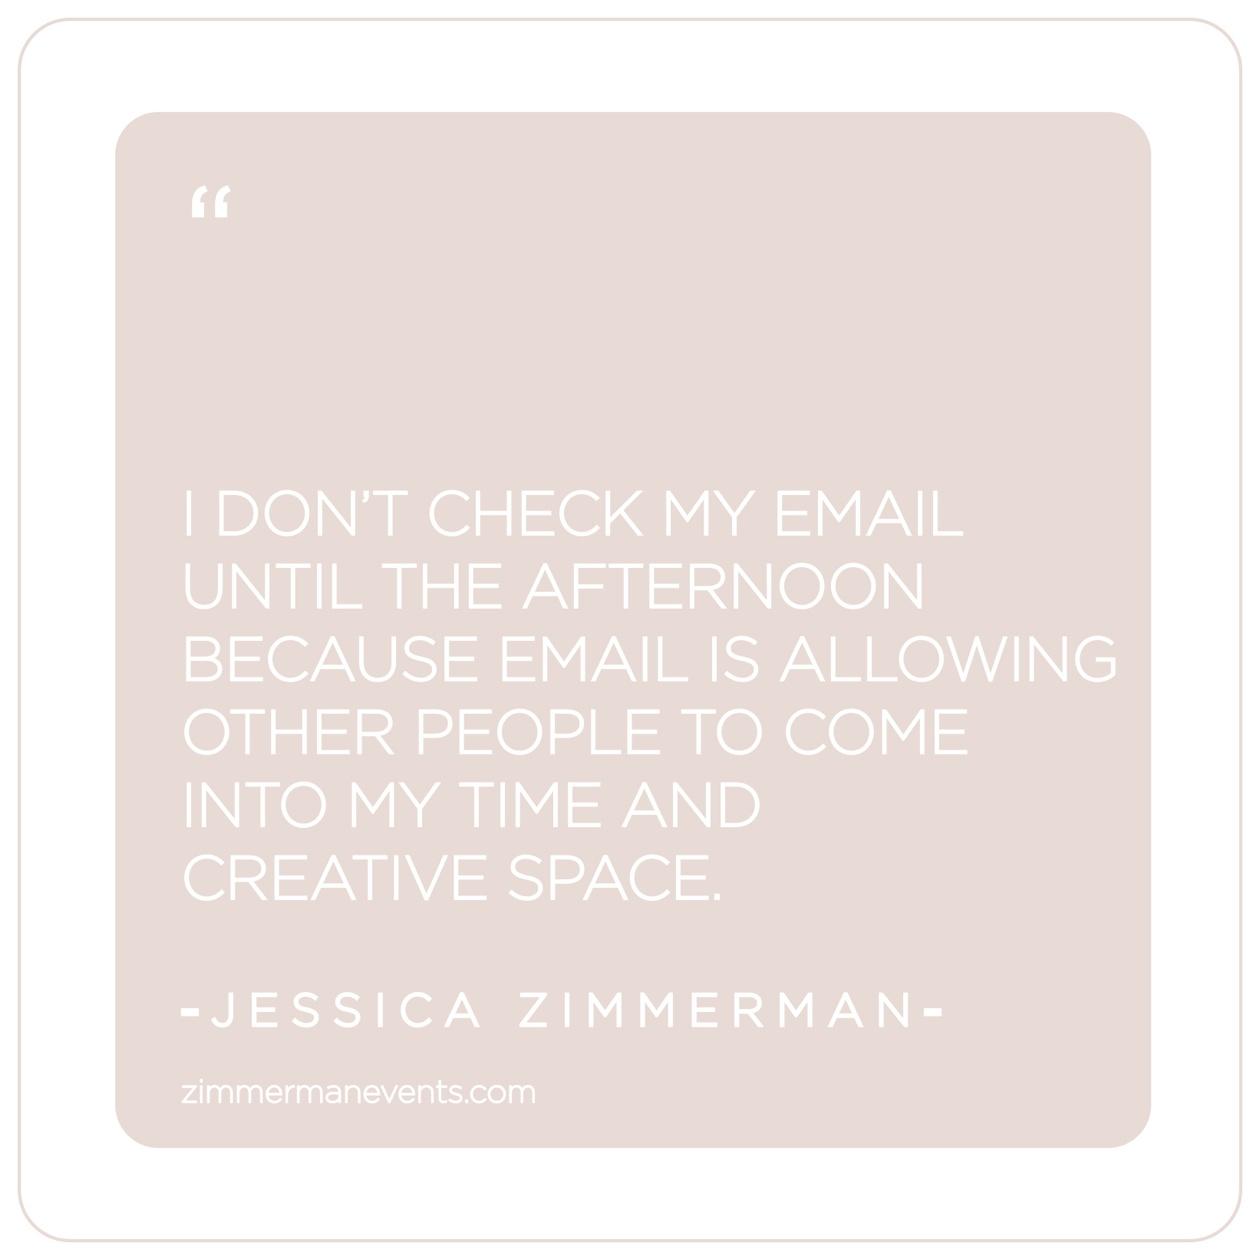 jessica-zimmerman-events-floral-event-design-conway-central-arkansas-wedding-planner-coordinator-mentoring-business-mom-entrepreneuer